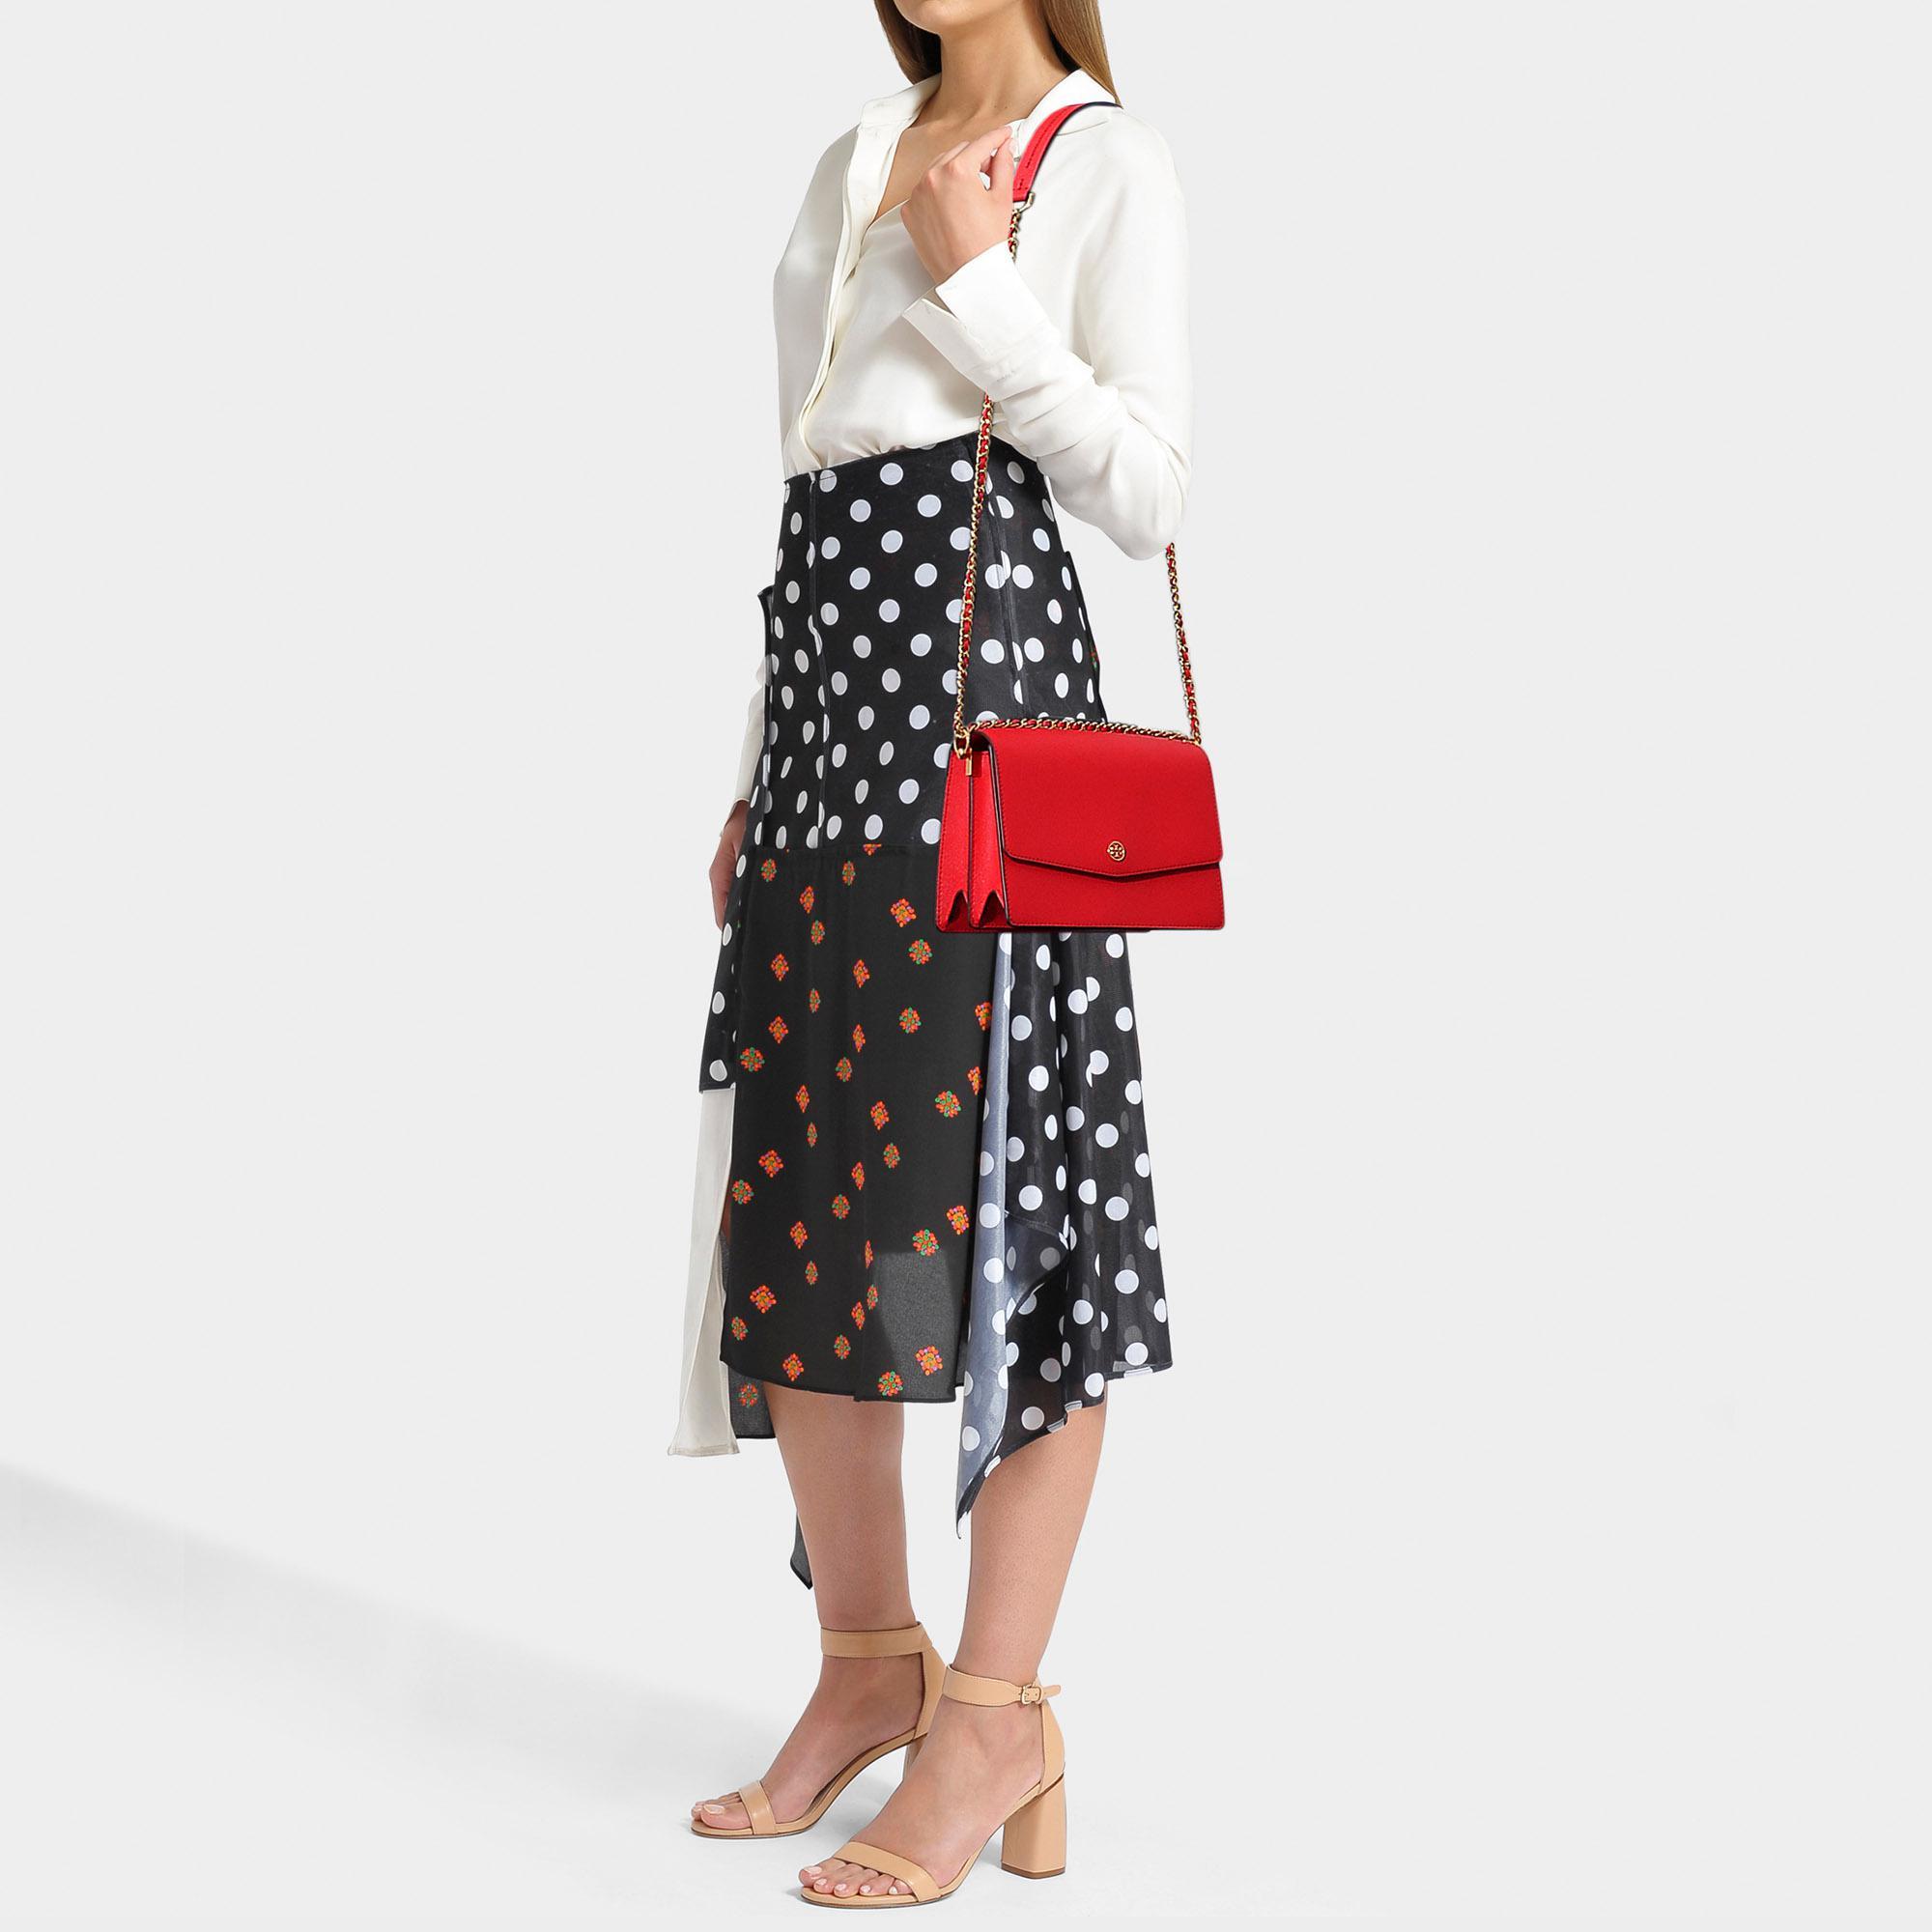 84b99f15d4d8 Tory Burch - Robinson Convertible Shoulder Bag In Brilliant Red Calfskin -  Lyst. View fullscreen